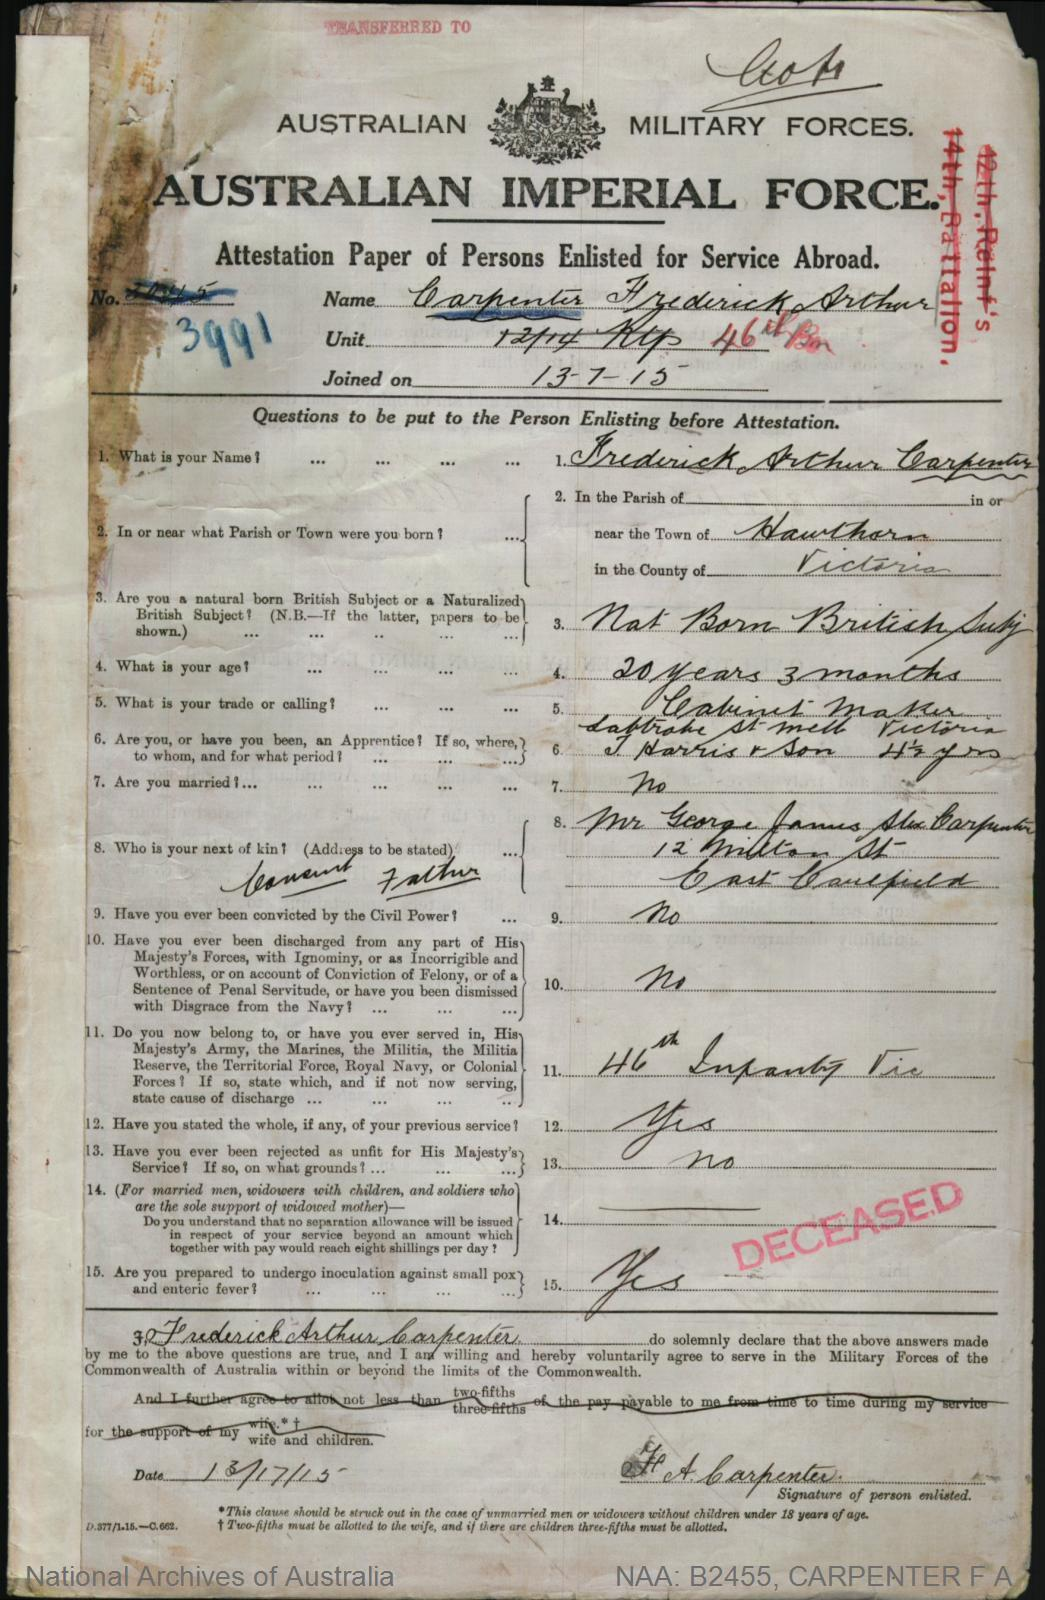 Carpenter Frederick Arthur : SERN 3991 : POB Hawthorn VIC : POE Melbourne VIC : NOK F Carpenter George James Alex